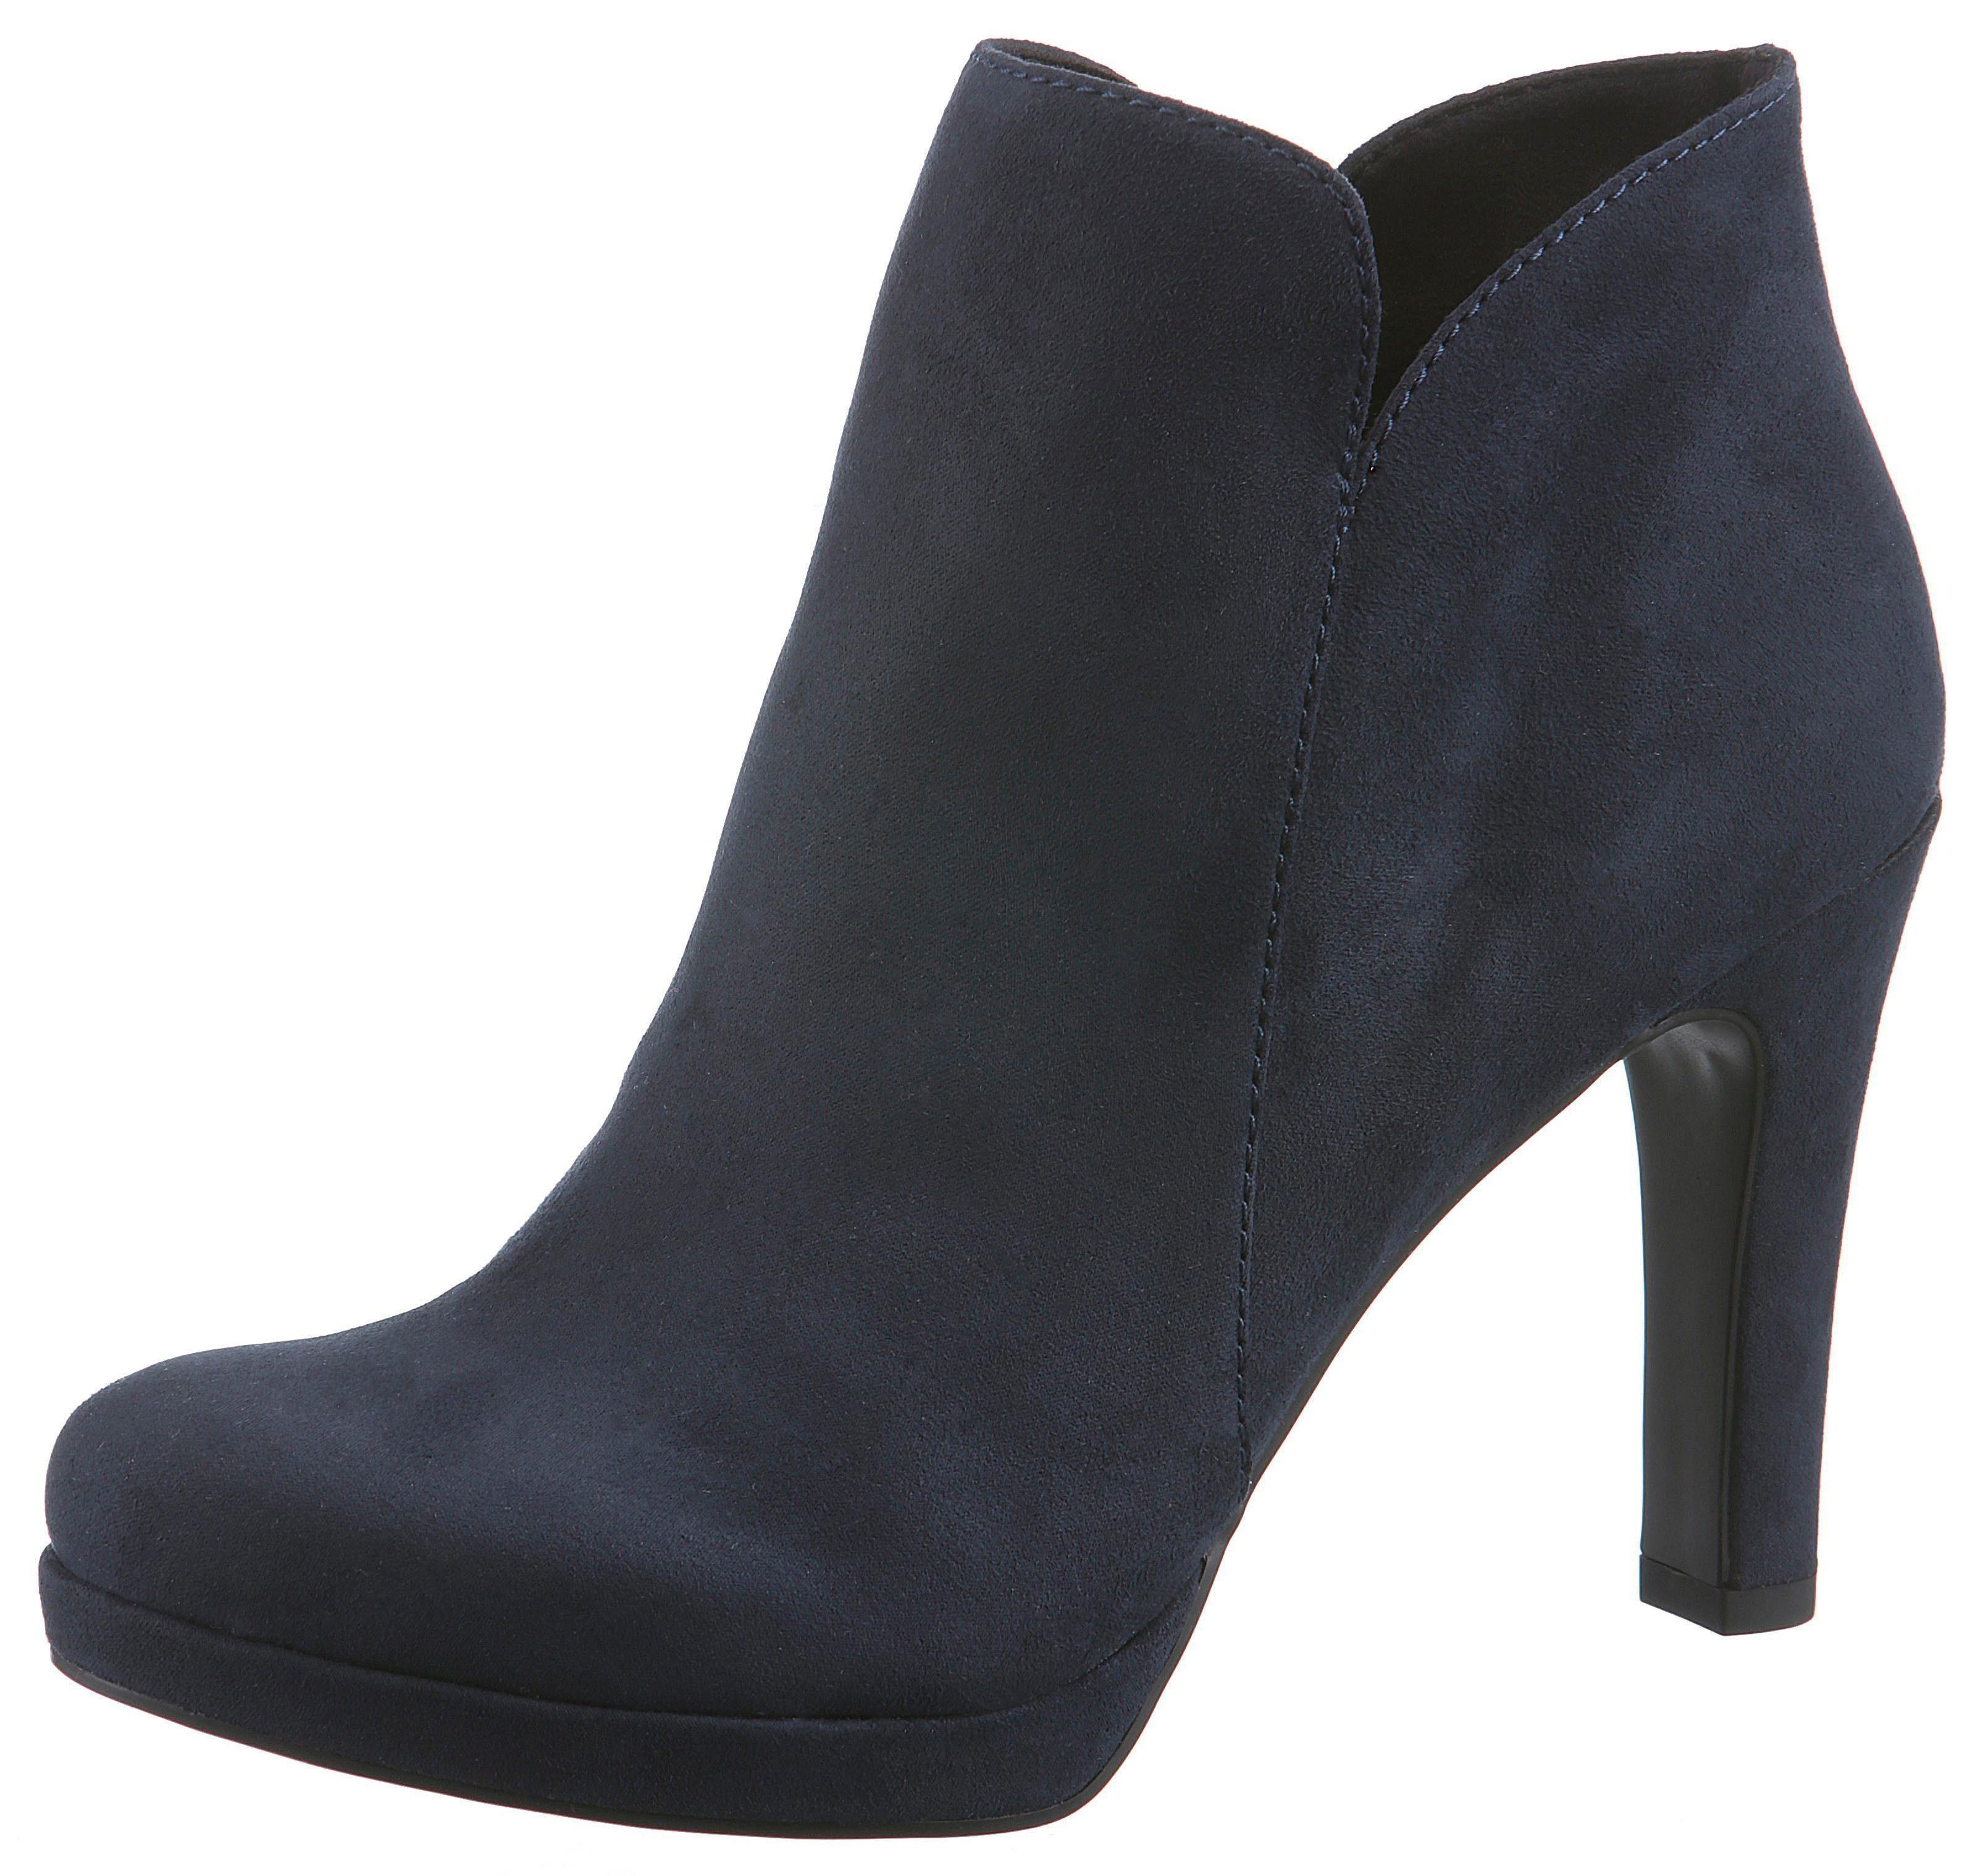 Tamaris High-Heel-Stiefelette   Schuhe > High Heels > High Heel Stiefeletten   Blau   Tamaris